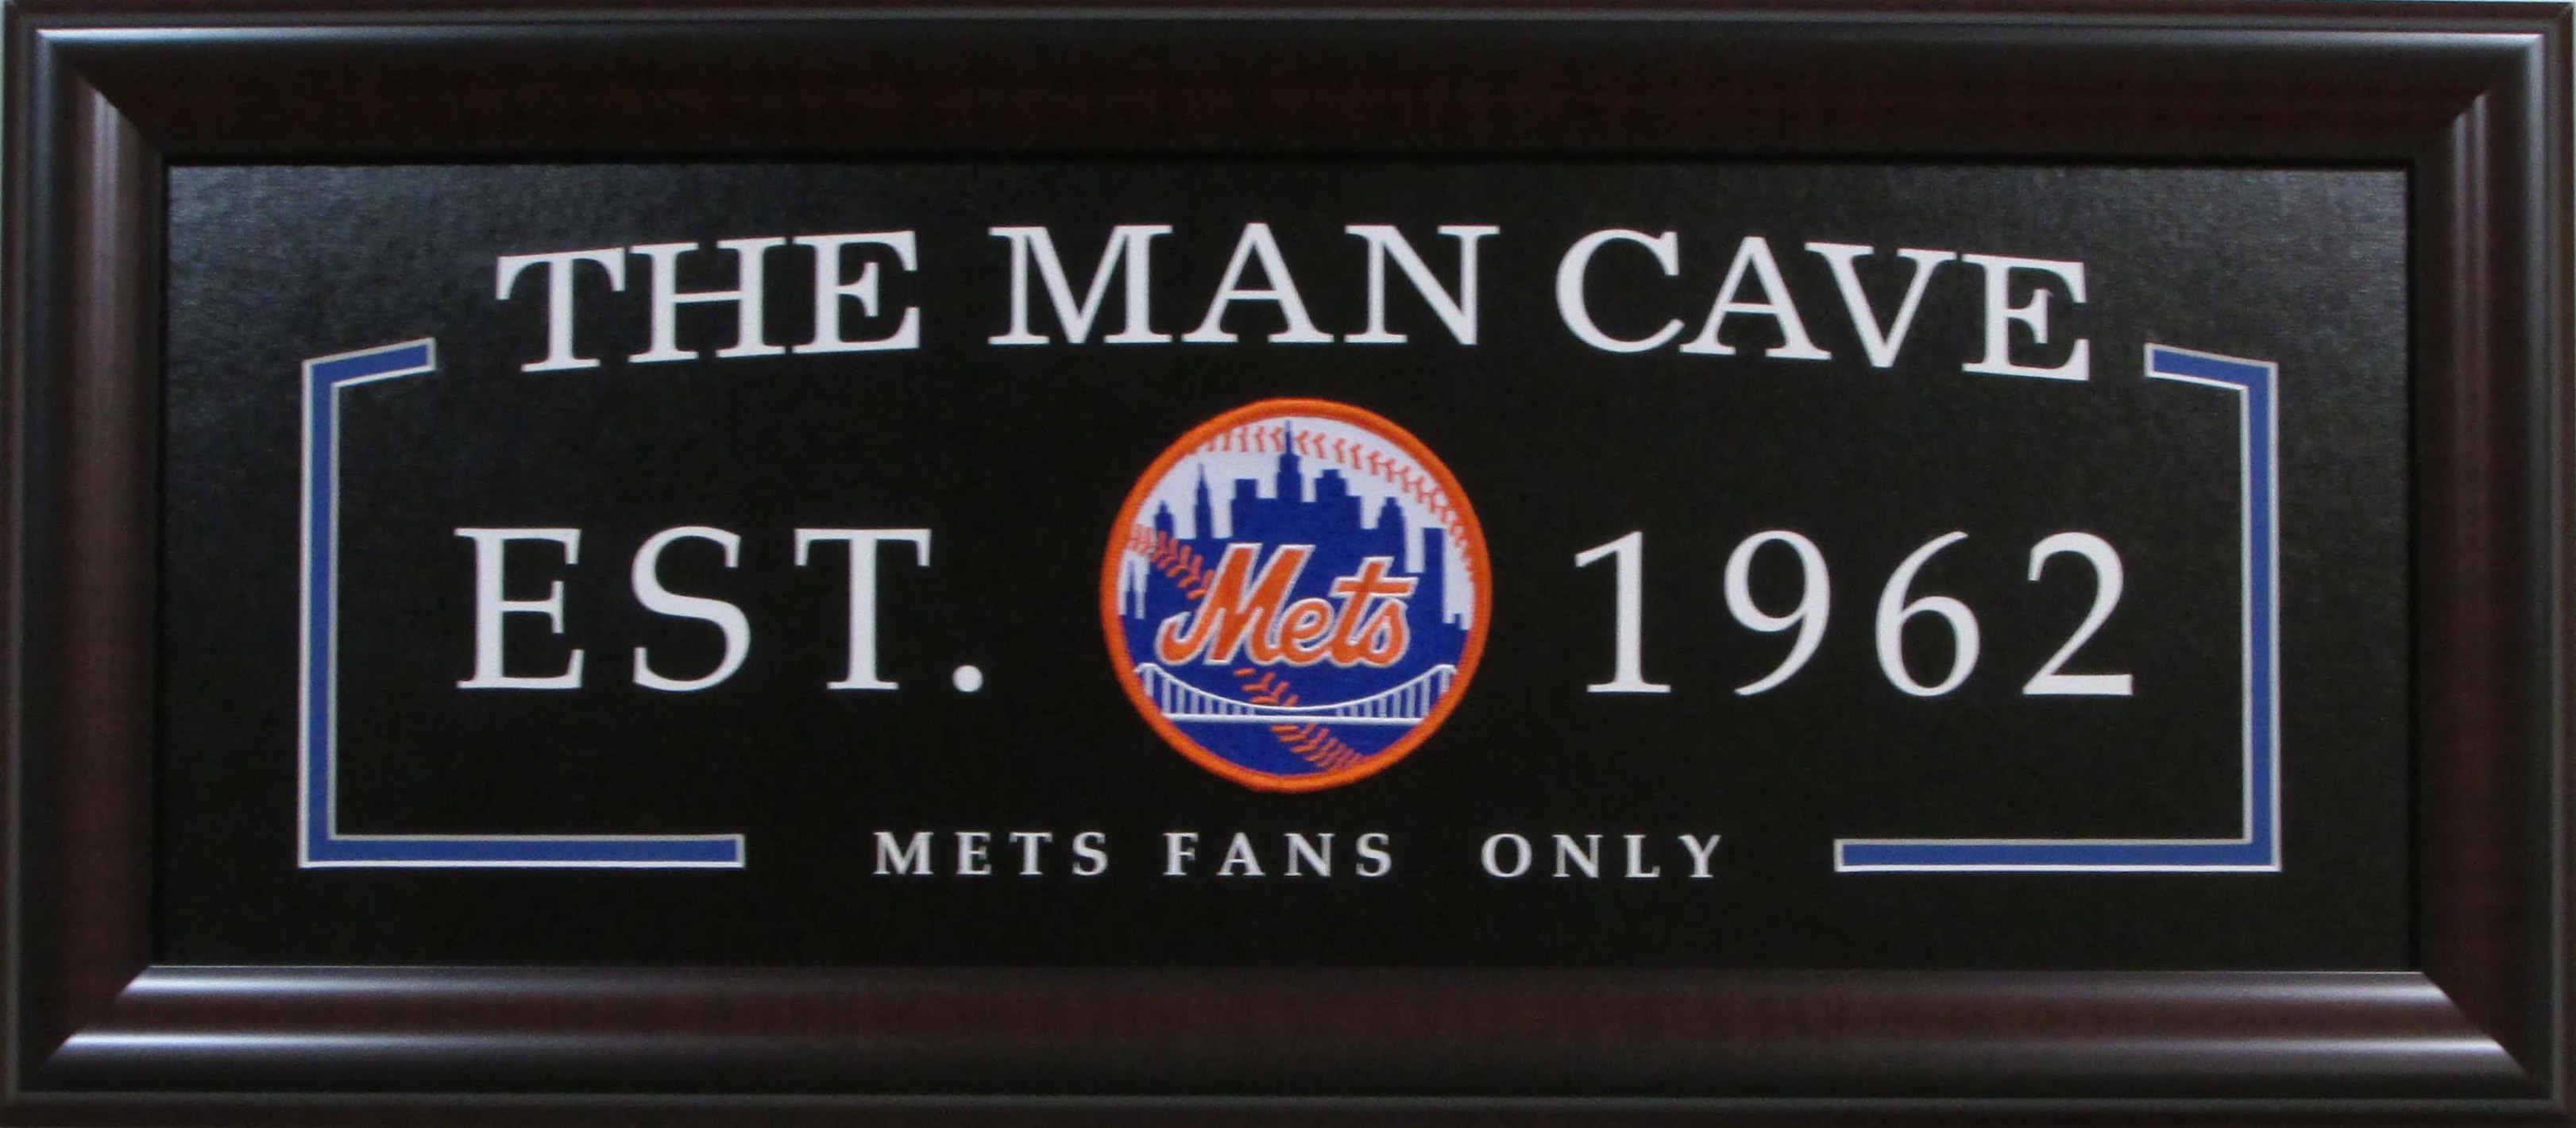 Mlb Man Cave Signs : Mlb baseball new york mets man cave sign framed